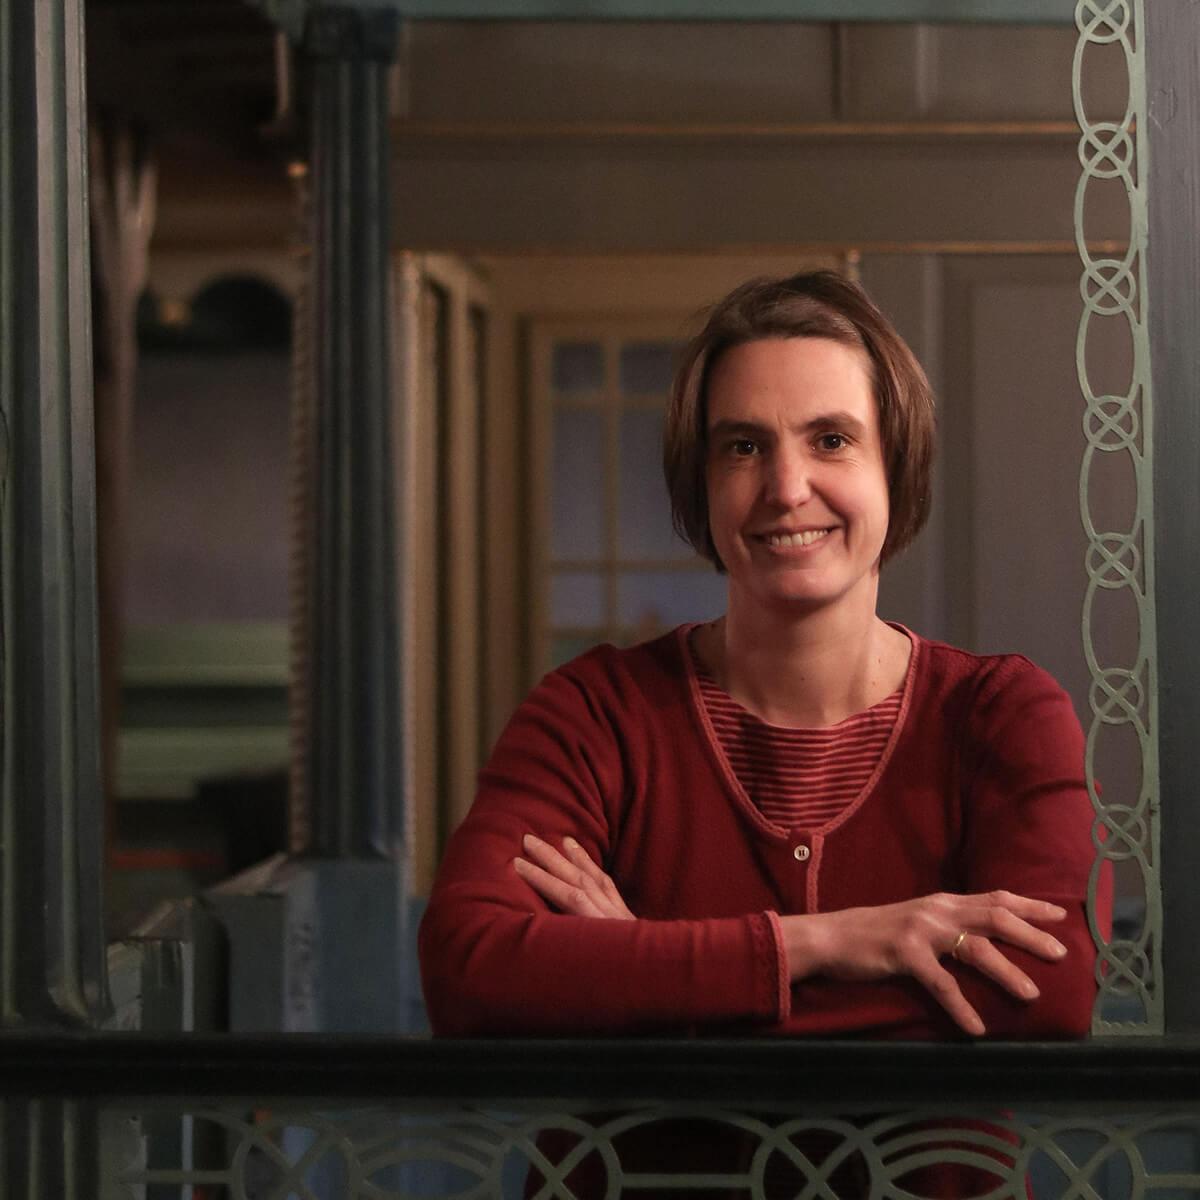 Pastorin Ulrike Verwold